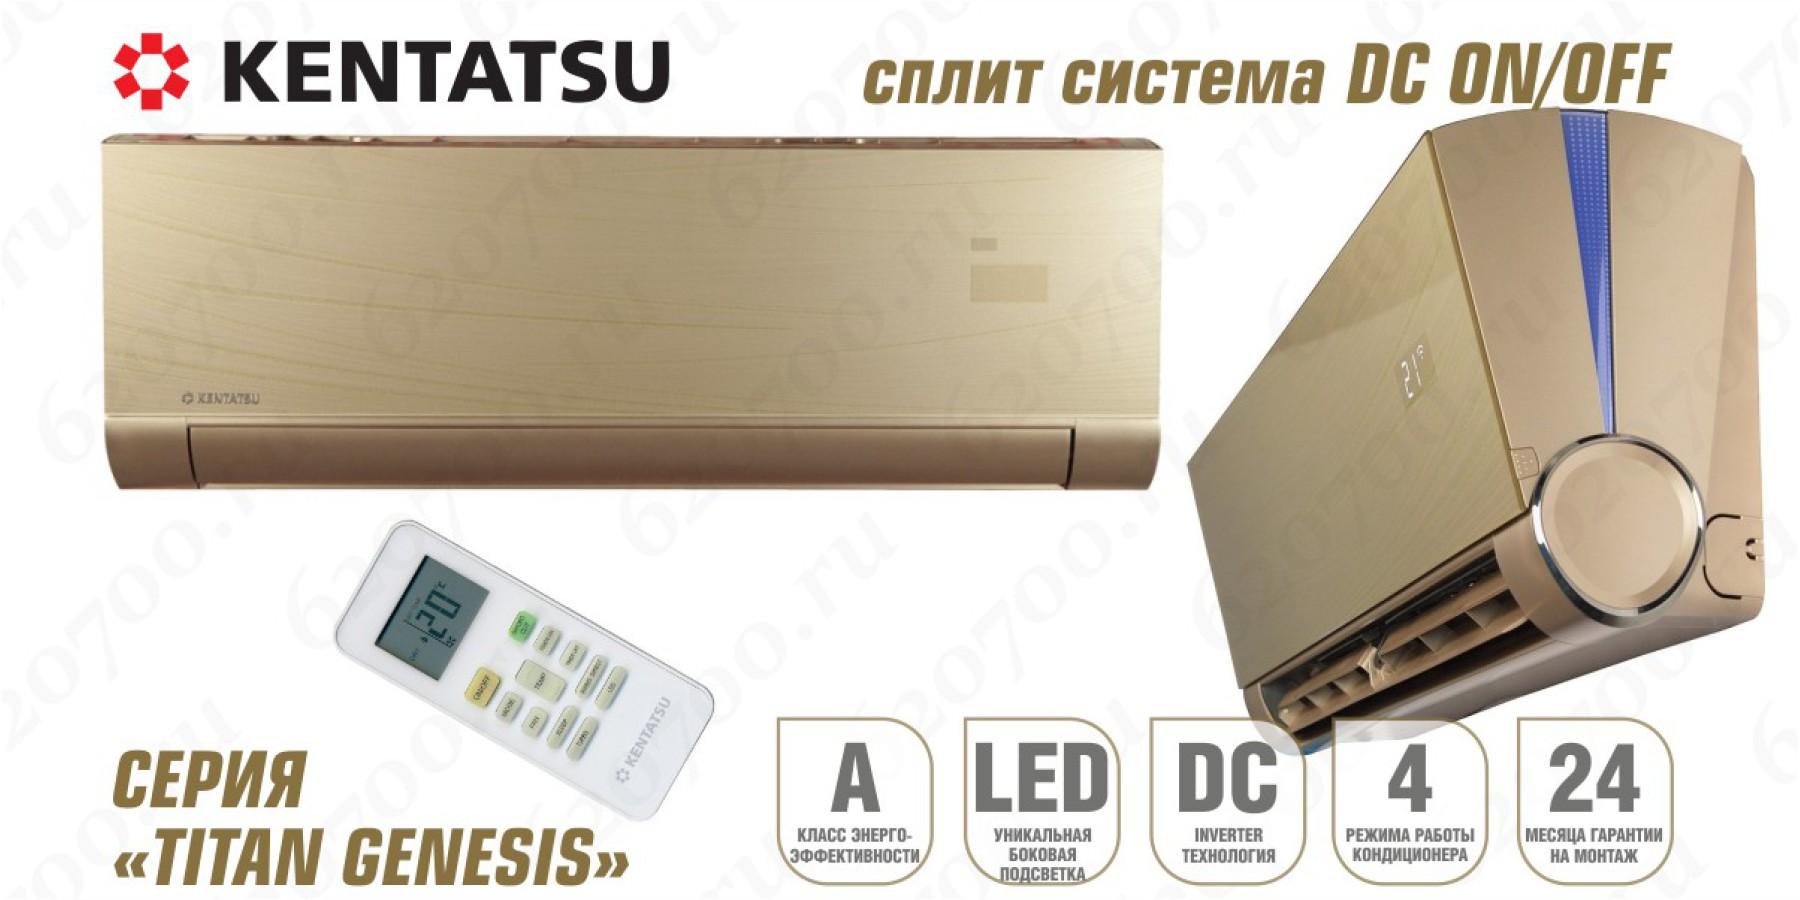 Сплит-система KENTATSU KSGX70HFAN1 / KSRX70HFAN1 цвет золотистый